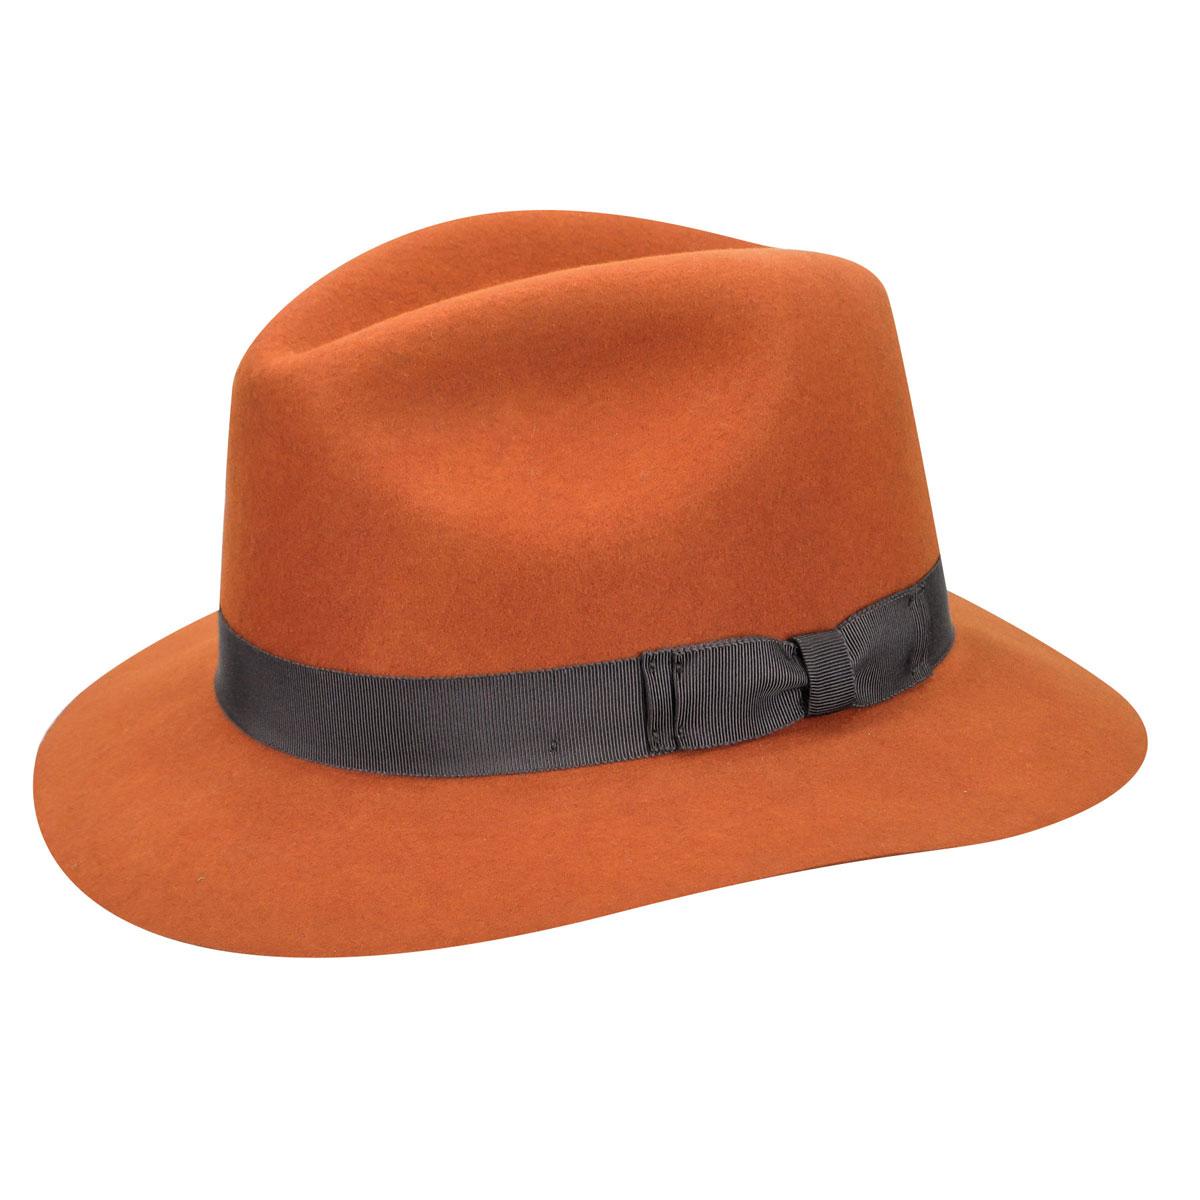 Pantropic Hunter LiteFelt Fedora in Burnt Orange